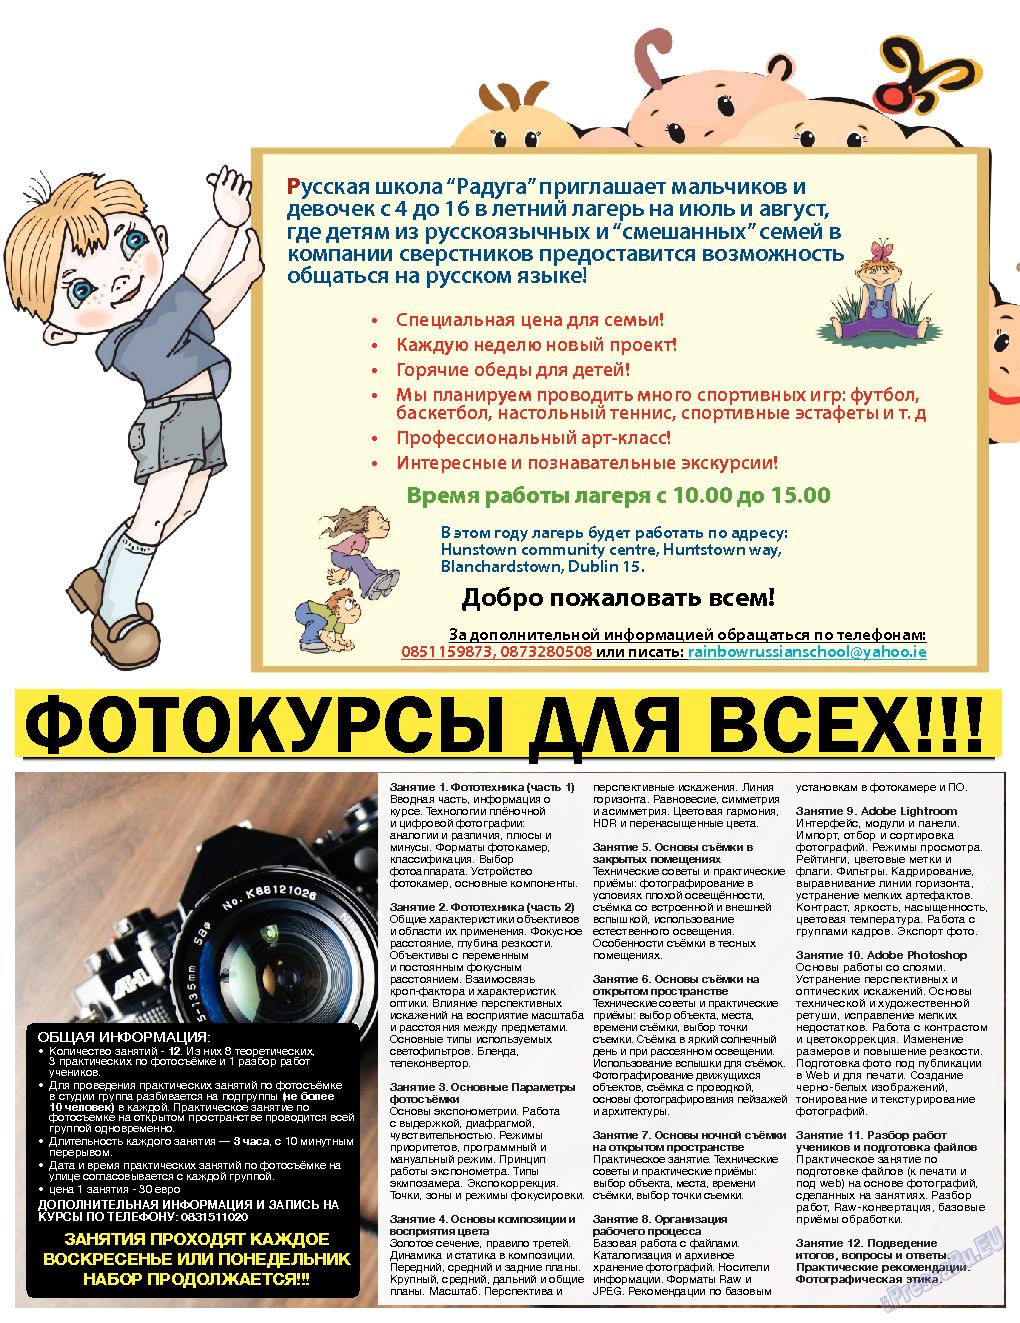 Дублин инфоцентр (газета). 2013 год, номер 25, стр. 12